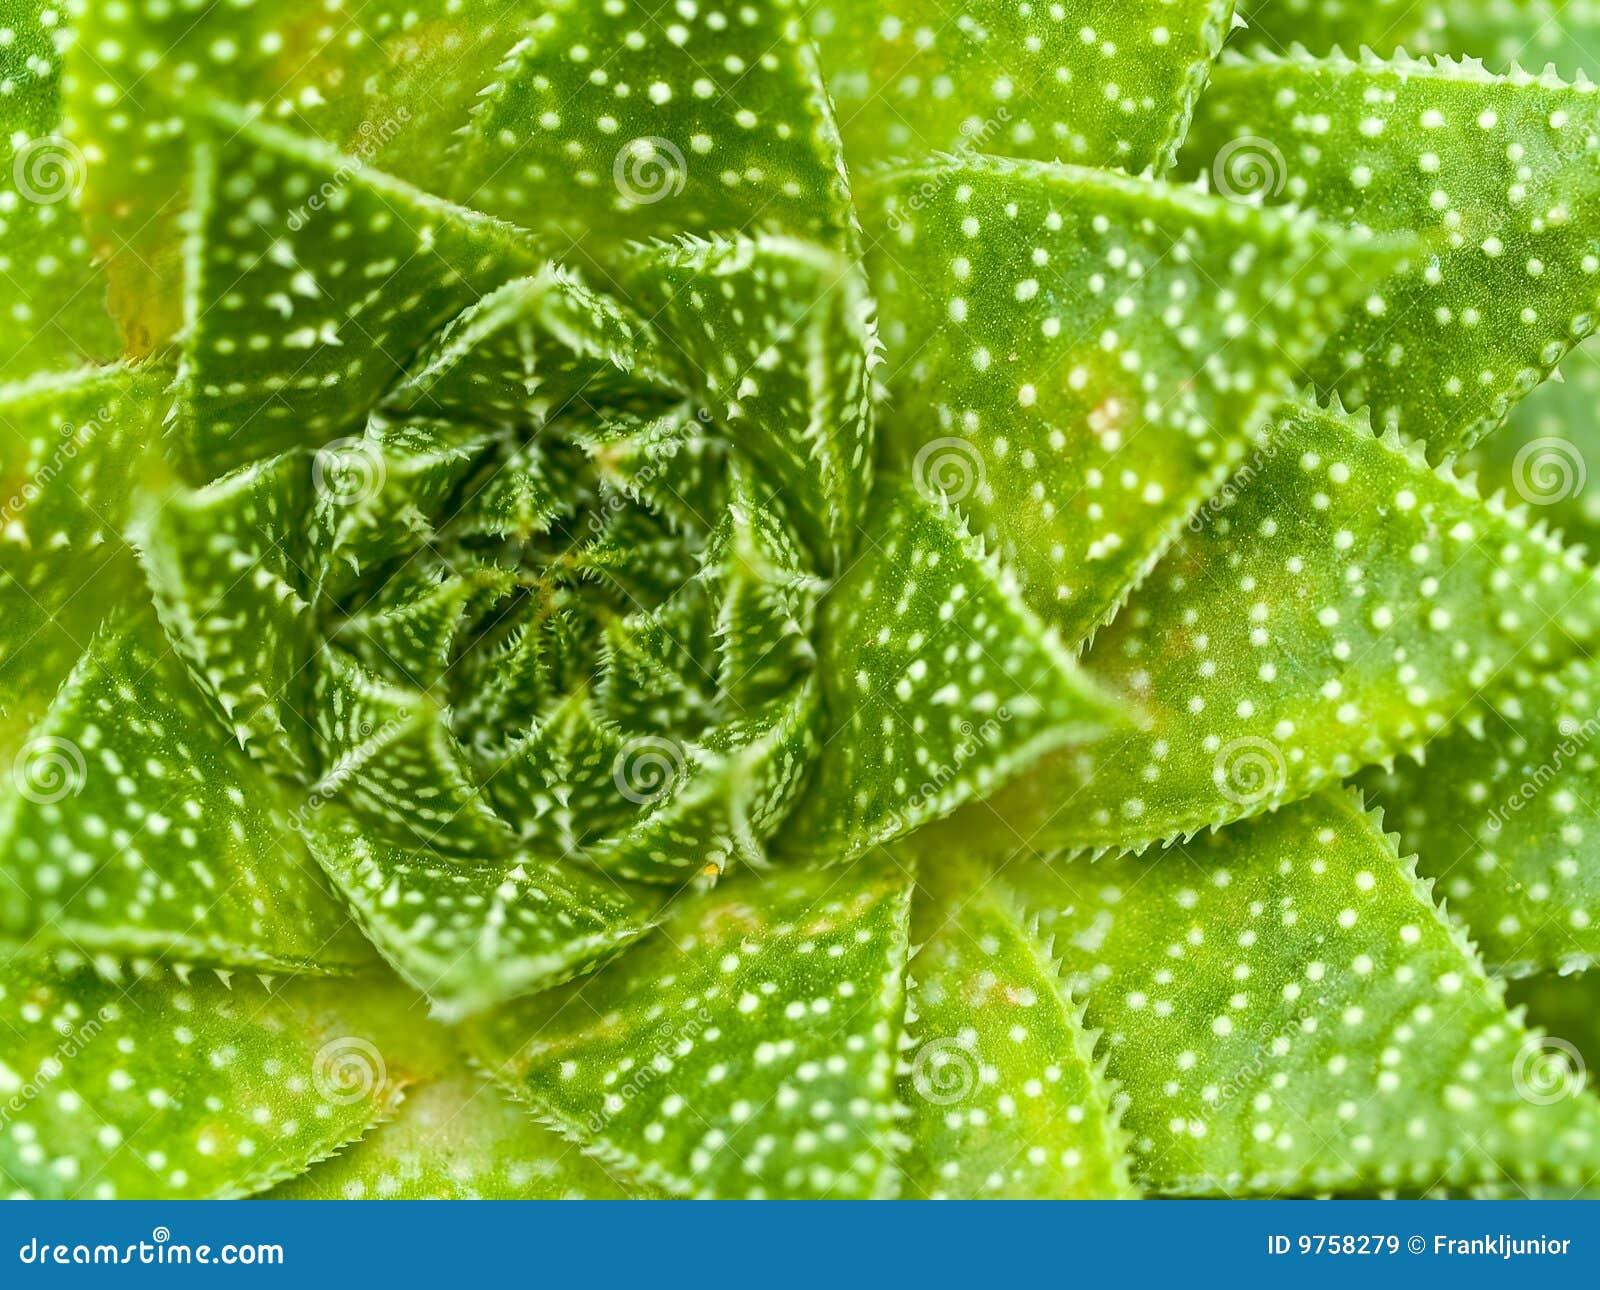 Succulent Cactus Macro Textures Scary